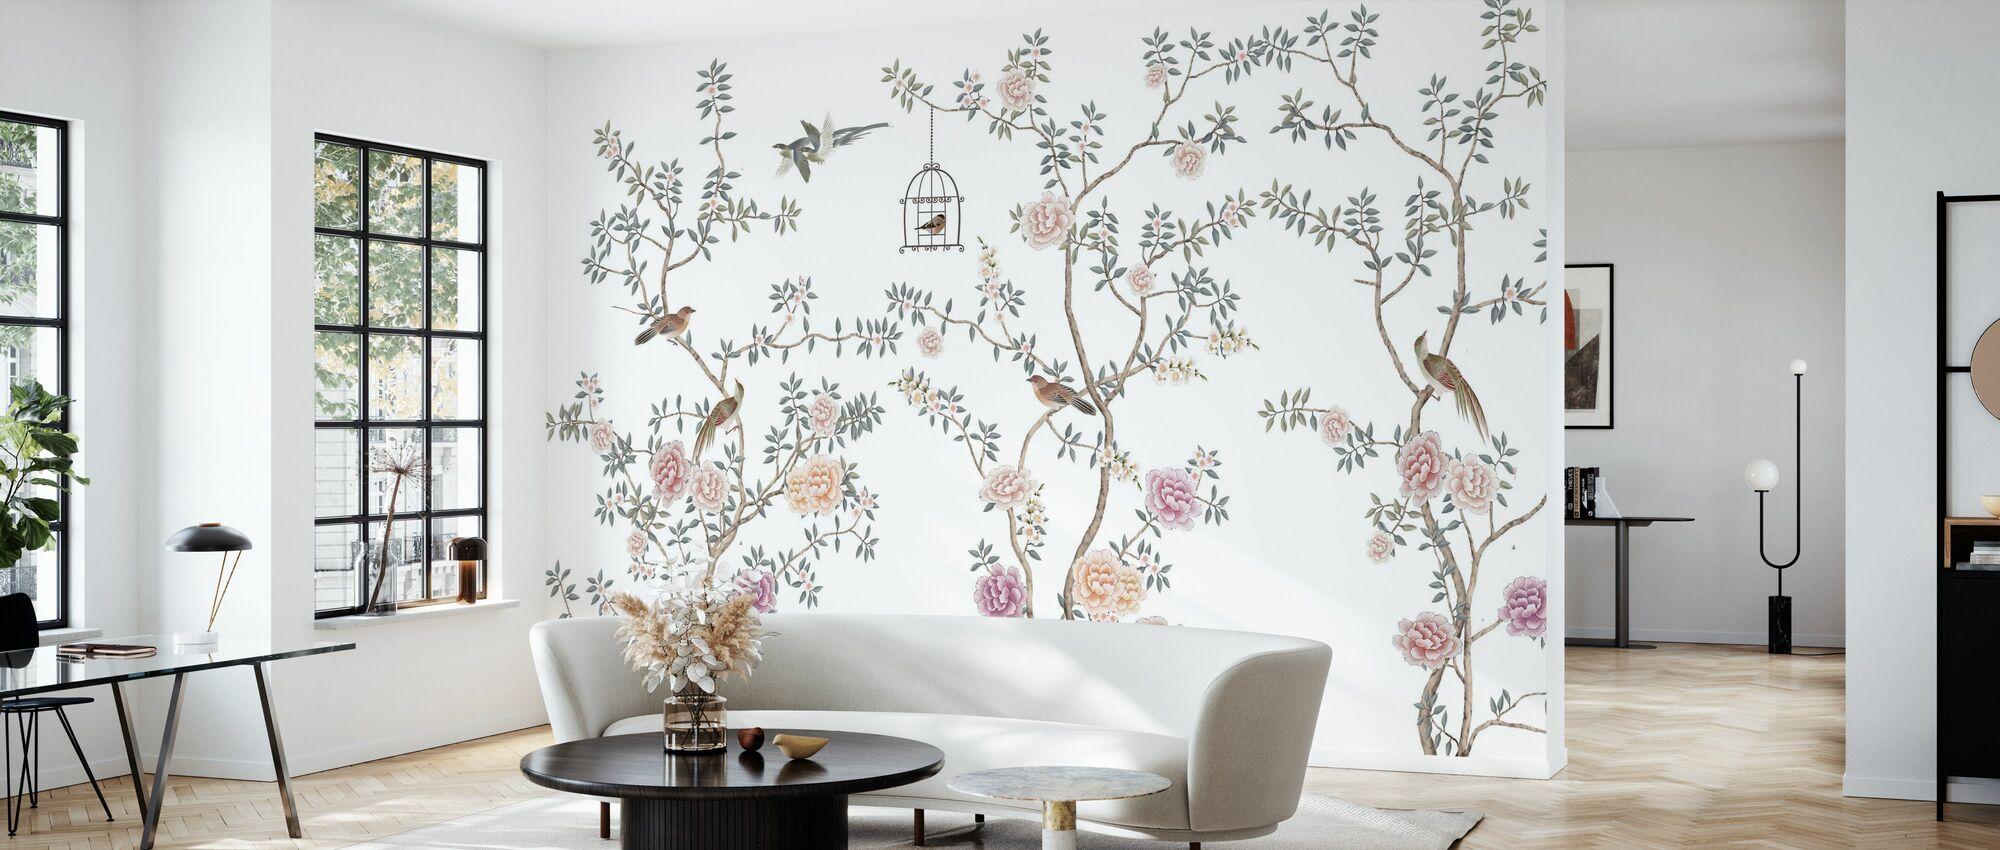 Fåglar Fairyland - Tapet - Vardagsrum